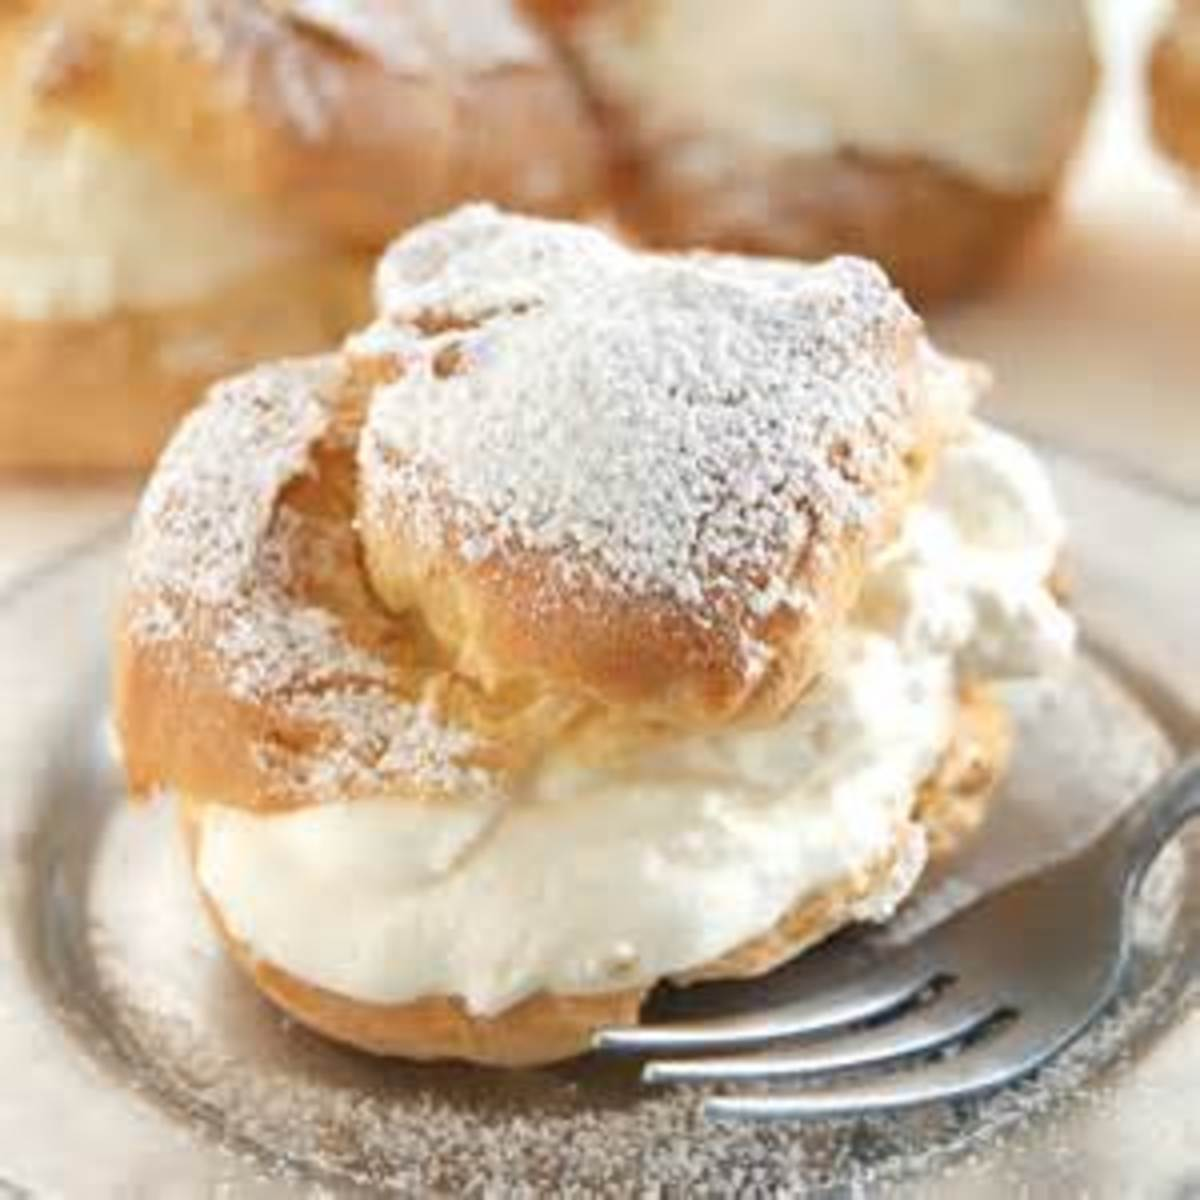 Whipped Cream Puff Dessert